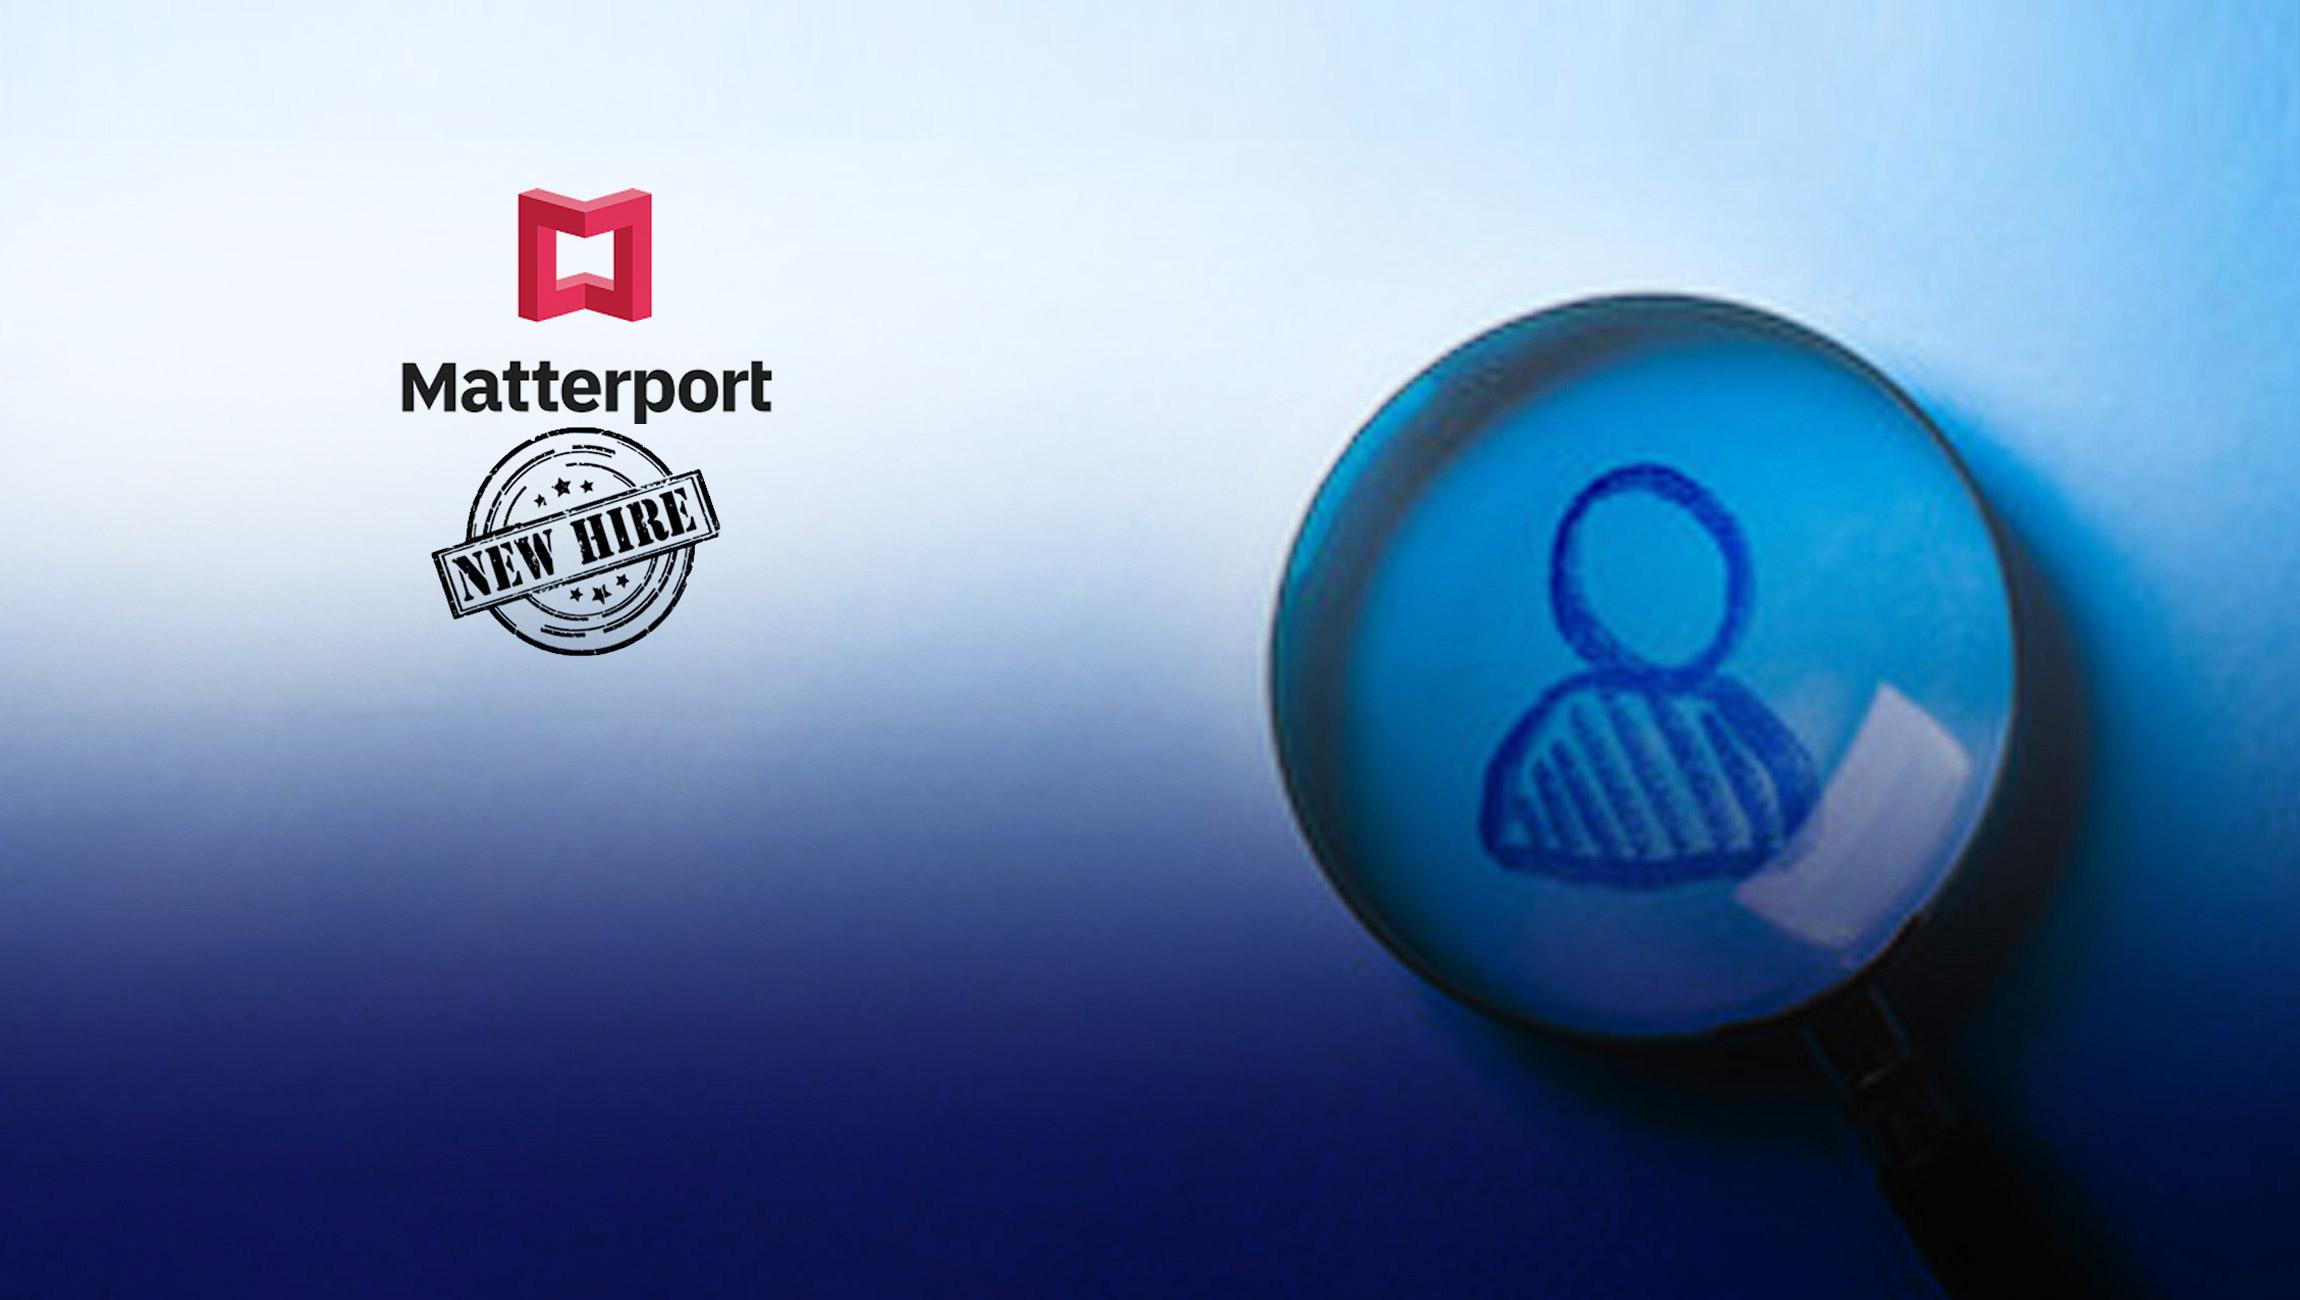 Matterport Names Pranab Sinha as Chief Information Officer